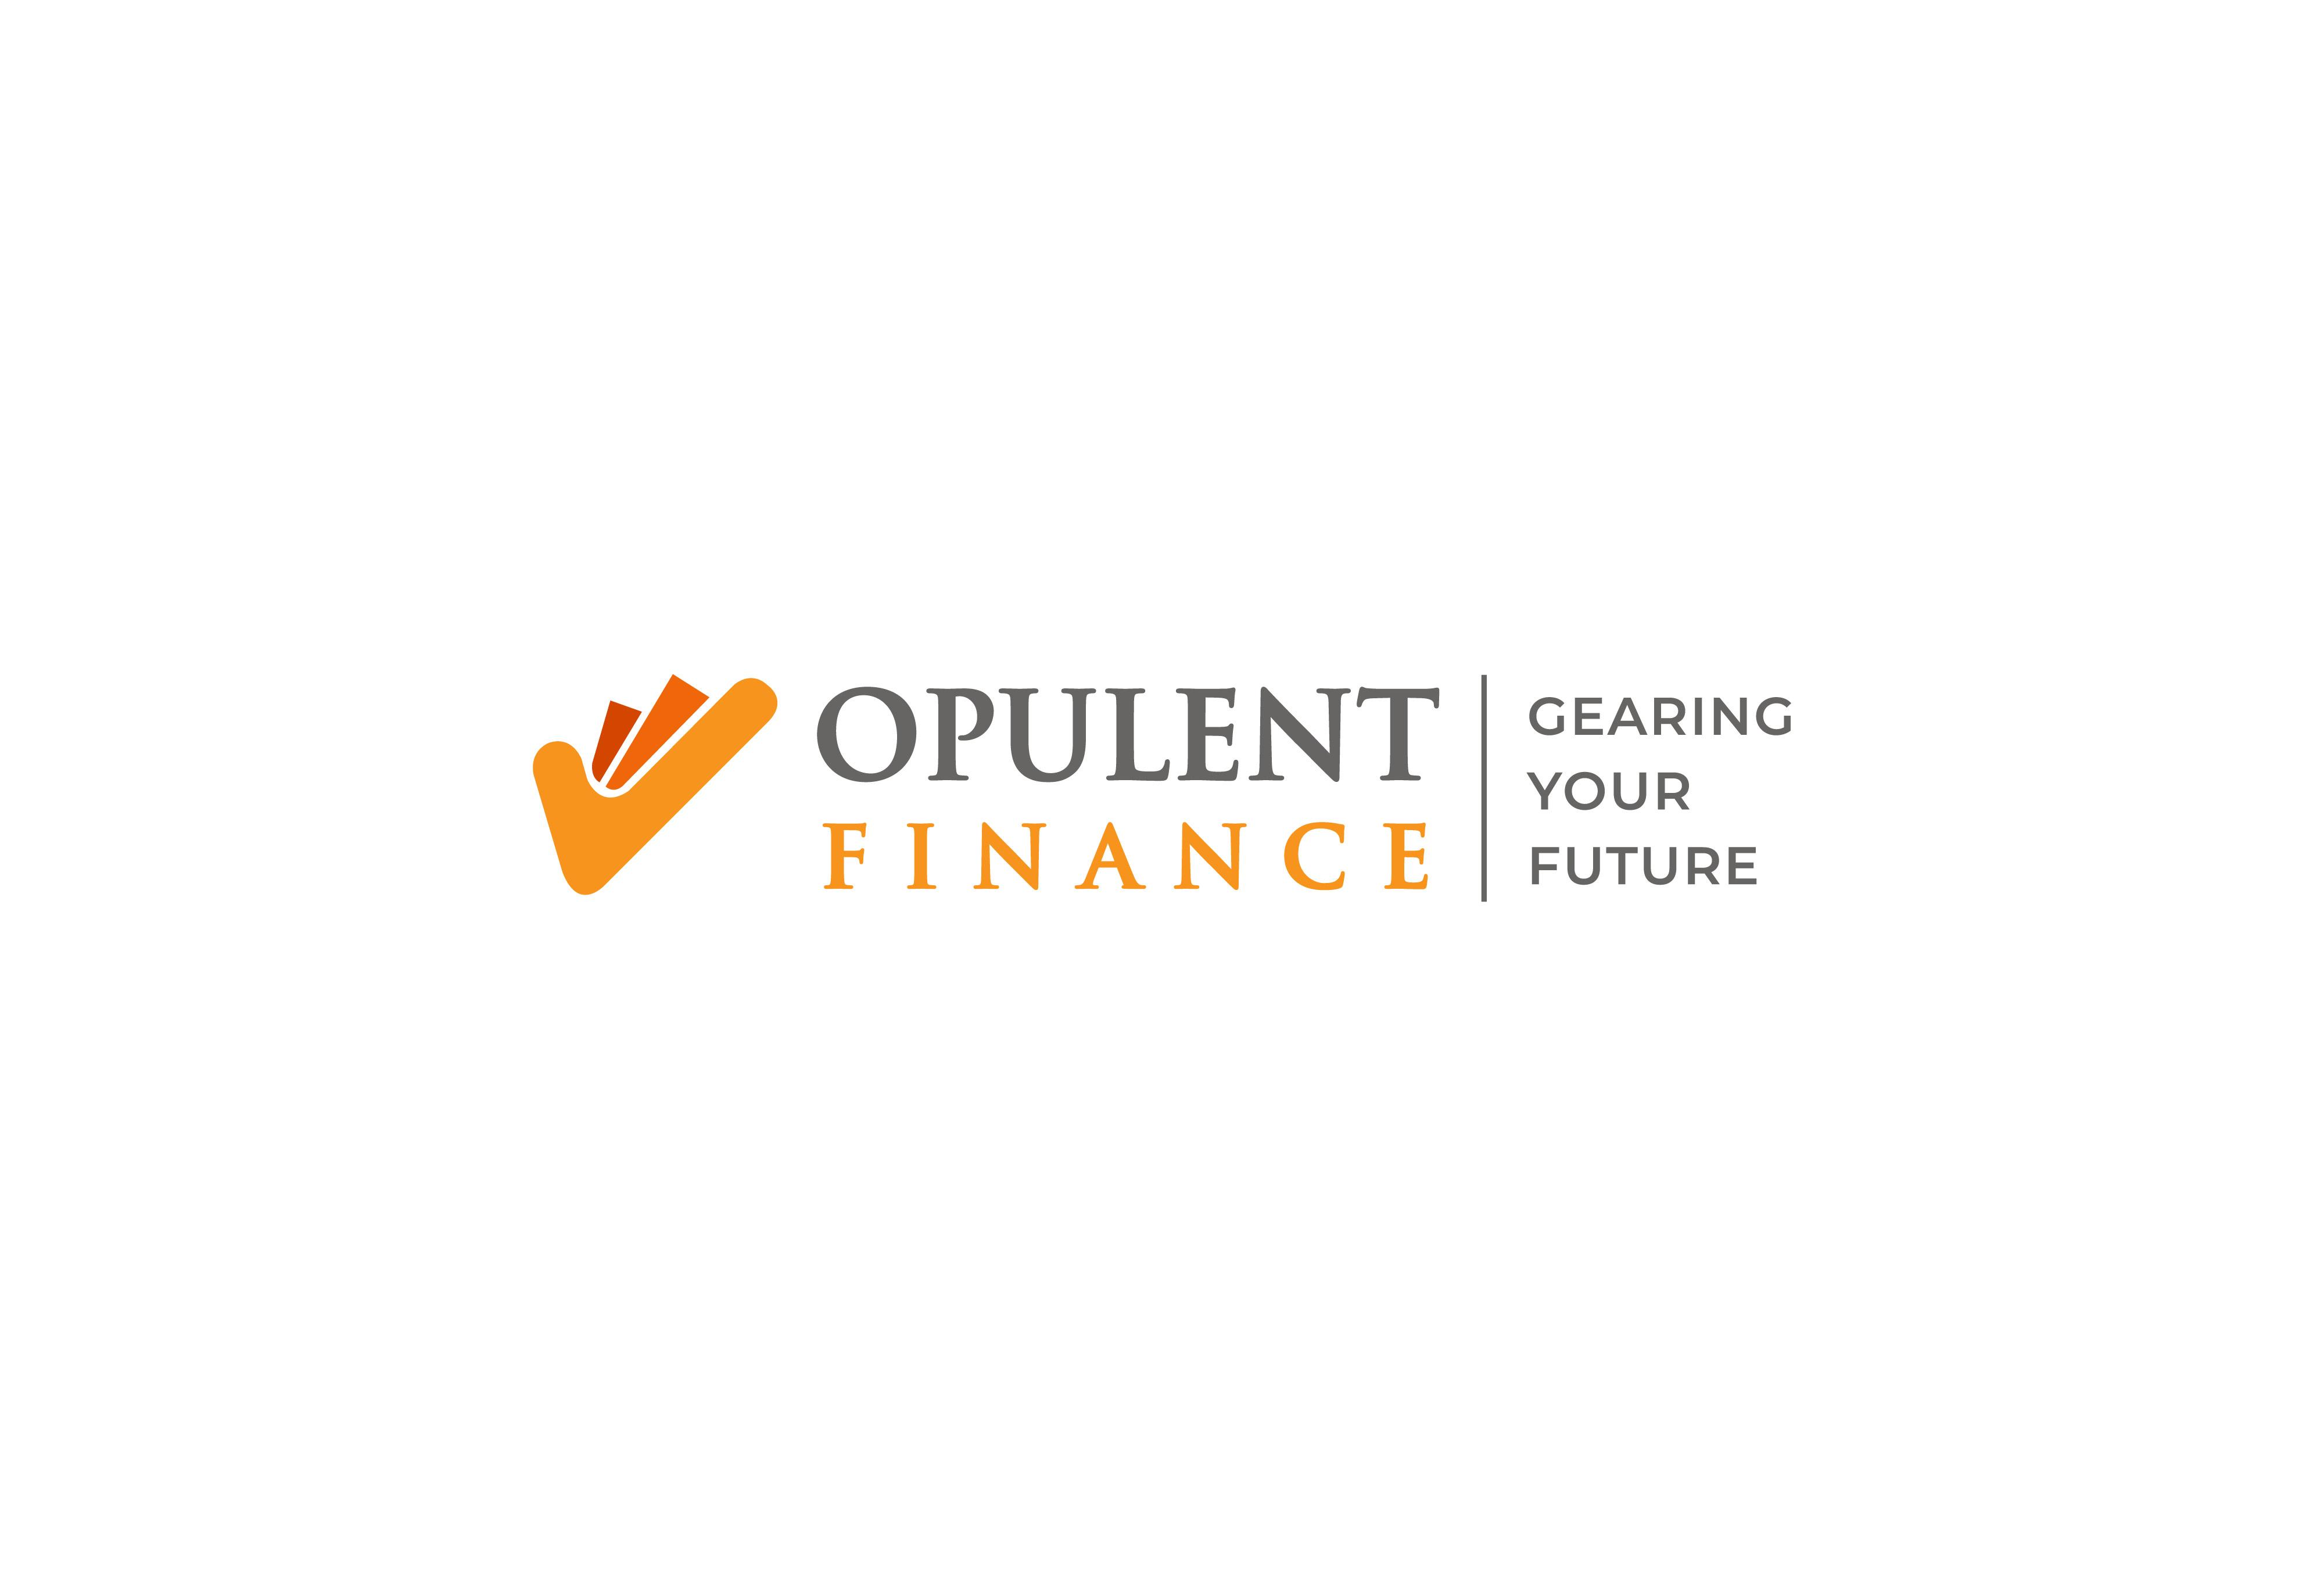 Opulent Finance - Commercial Finance Brokers Melbourne | Mount Waverley and Glen Waverley for Best Home Loan Rates